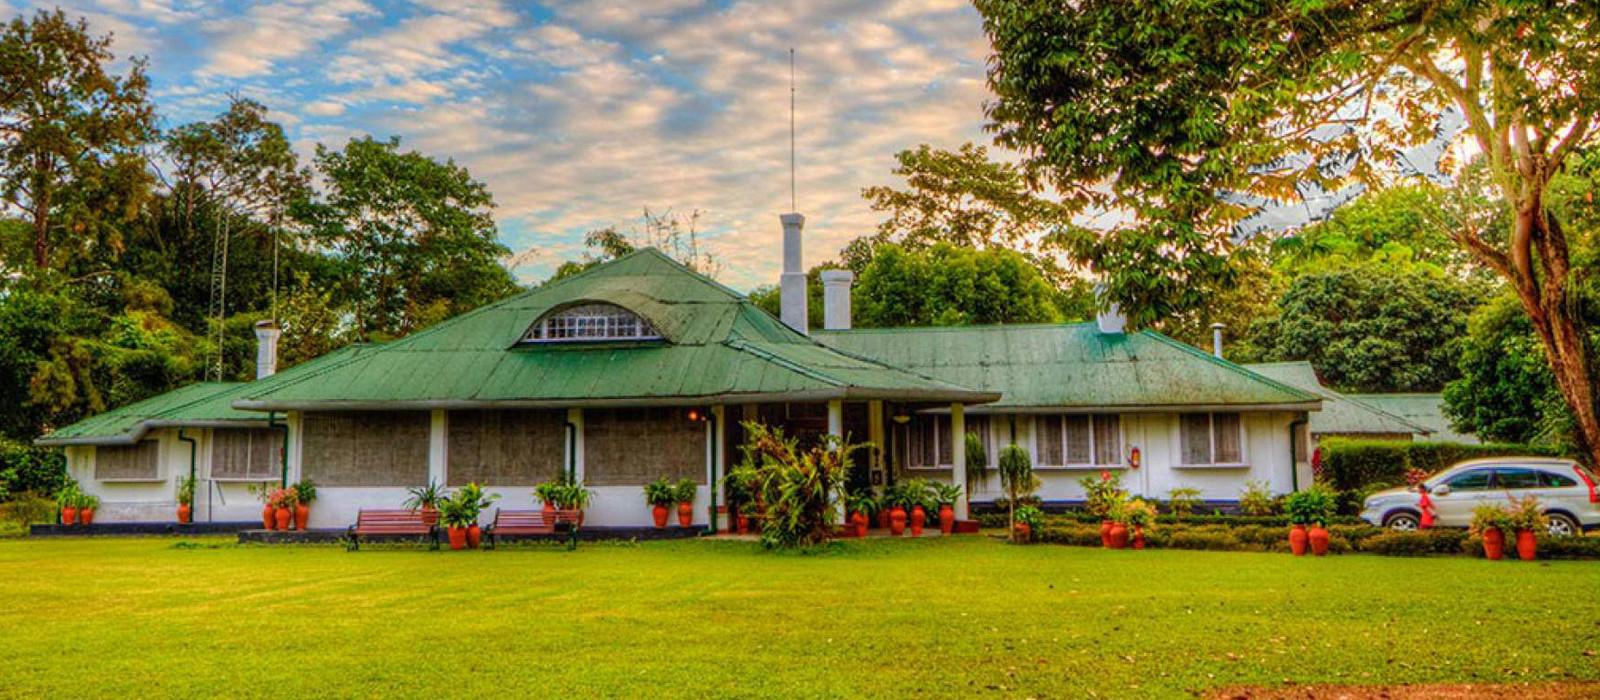 Hotel Wild Mahseer Heritage Bungalow %region%